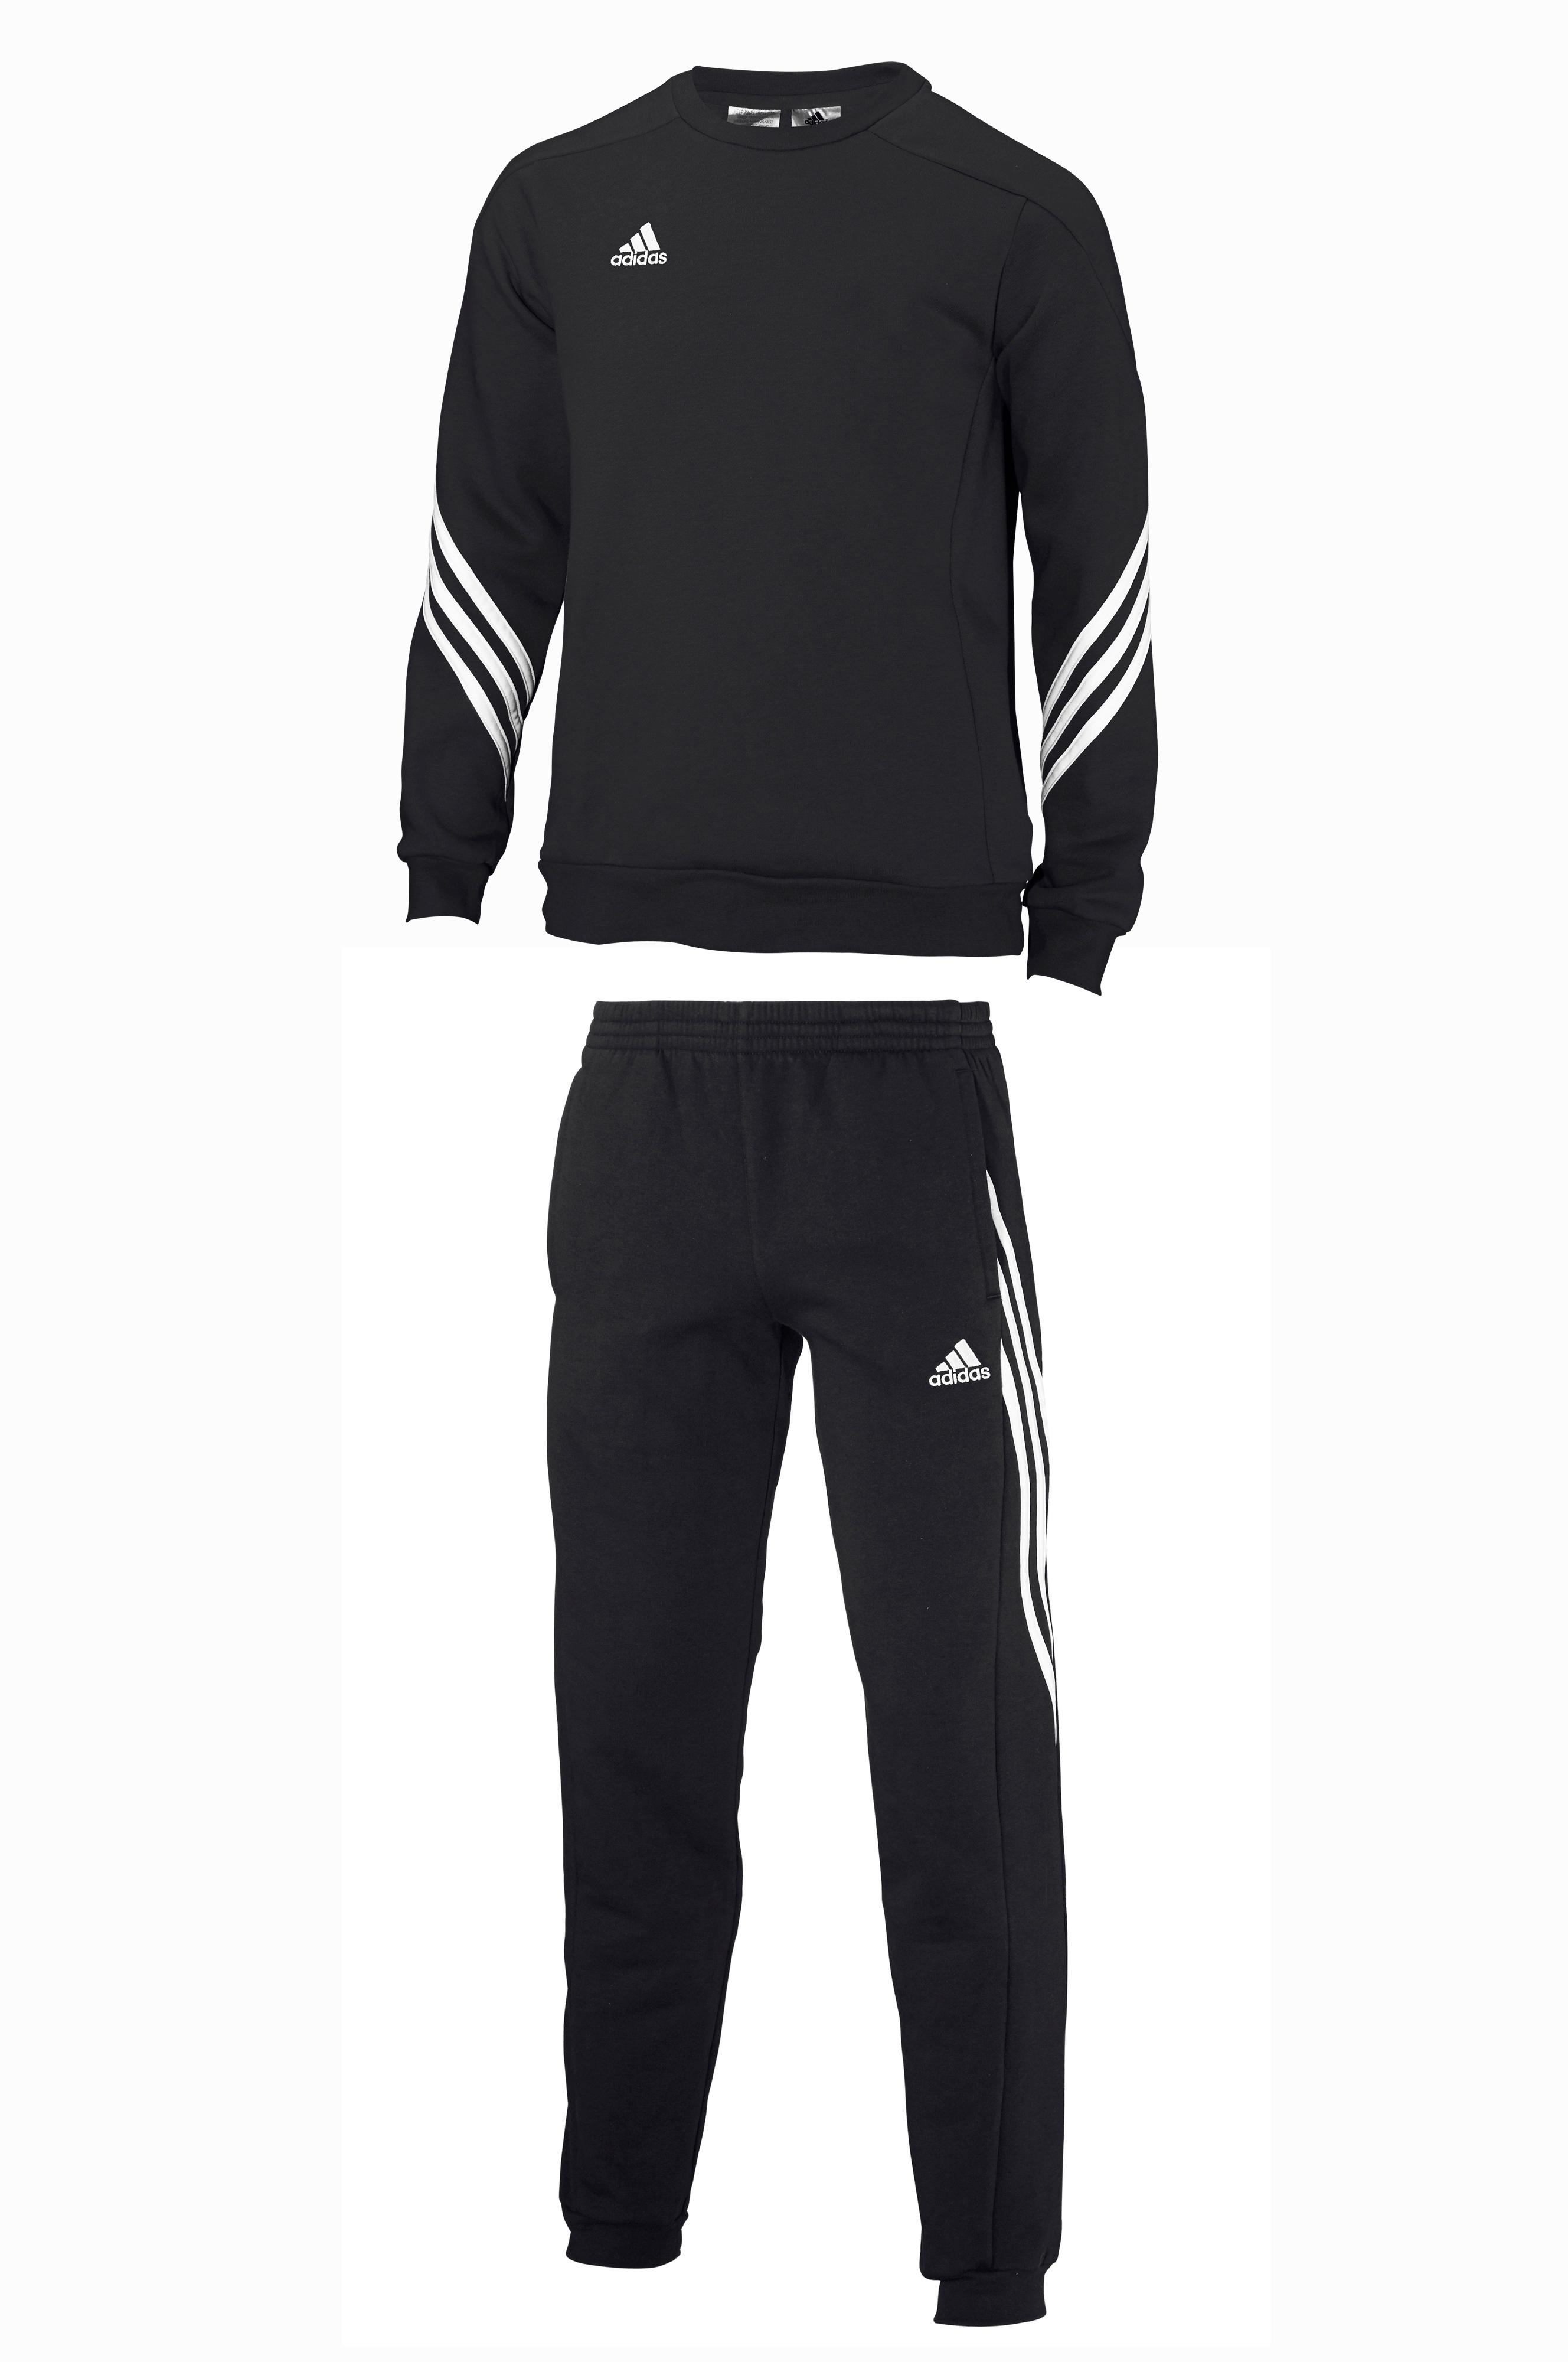 adidas Sport Performance Sere14 SWT SU Y -collegepusero + housut - Musta -  Lapset - Ellos.fi 46d4f73fc9